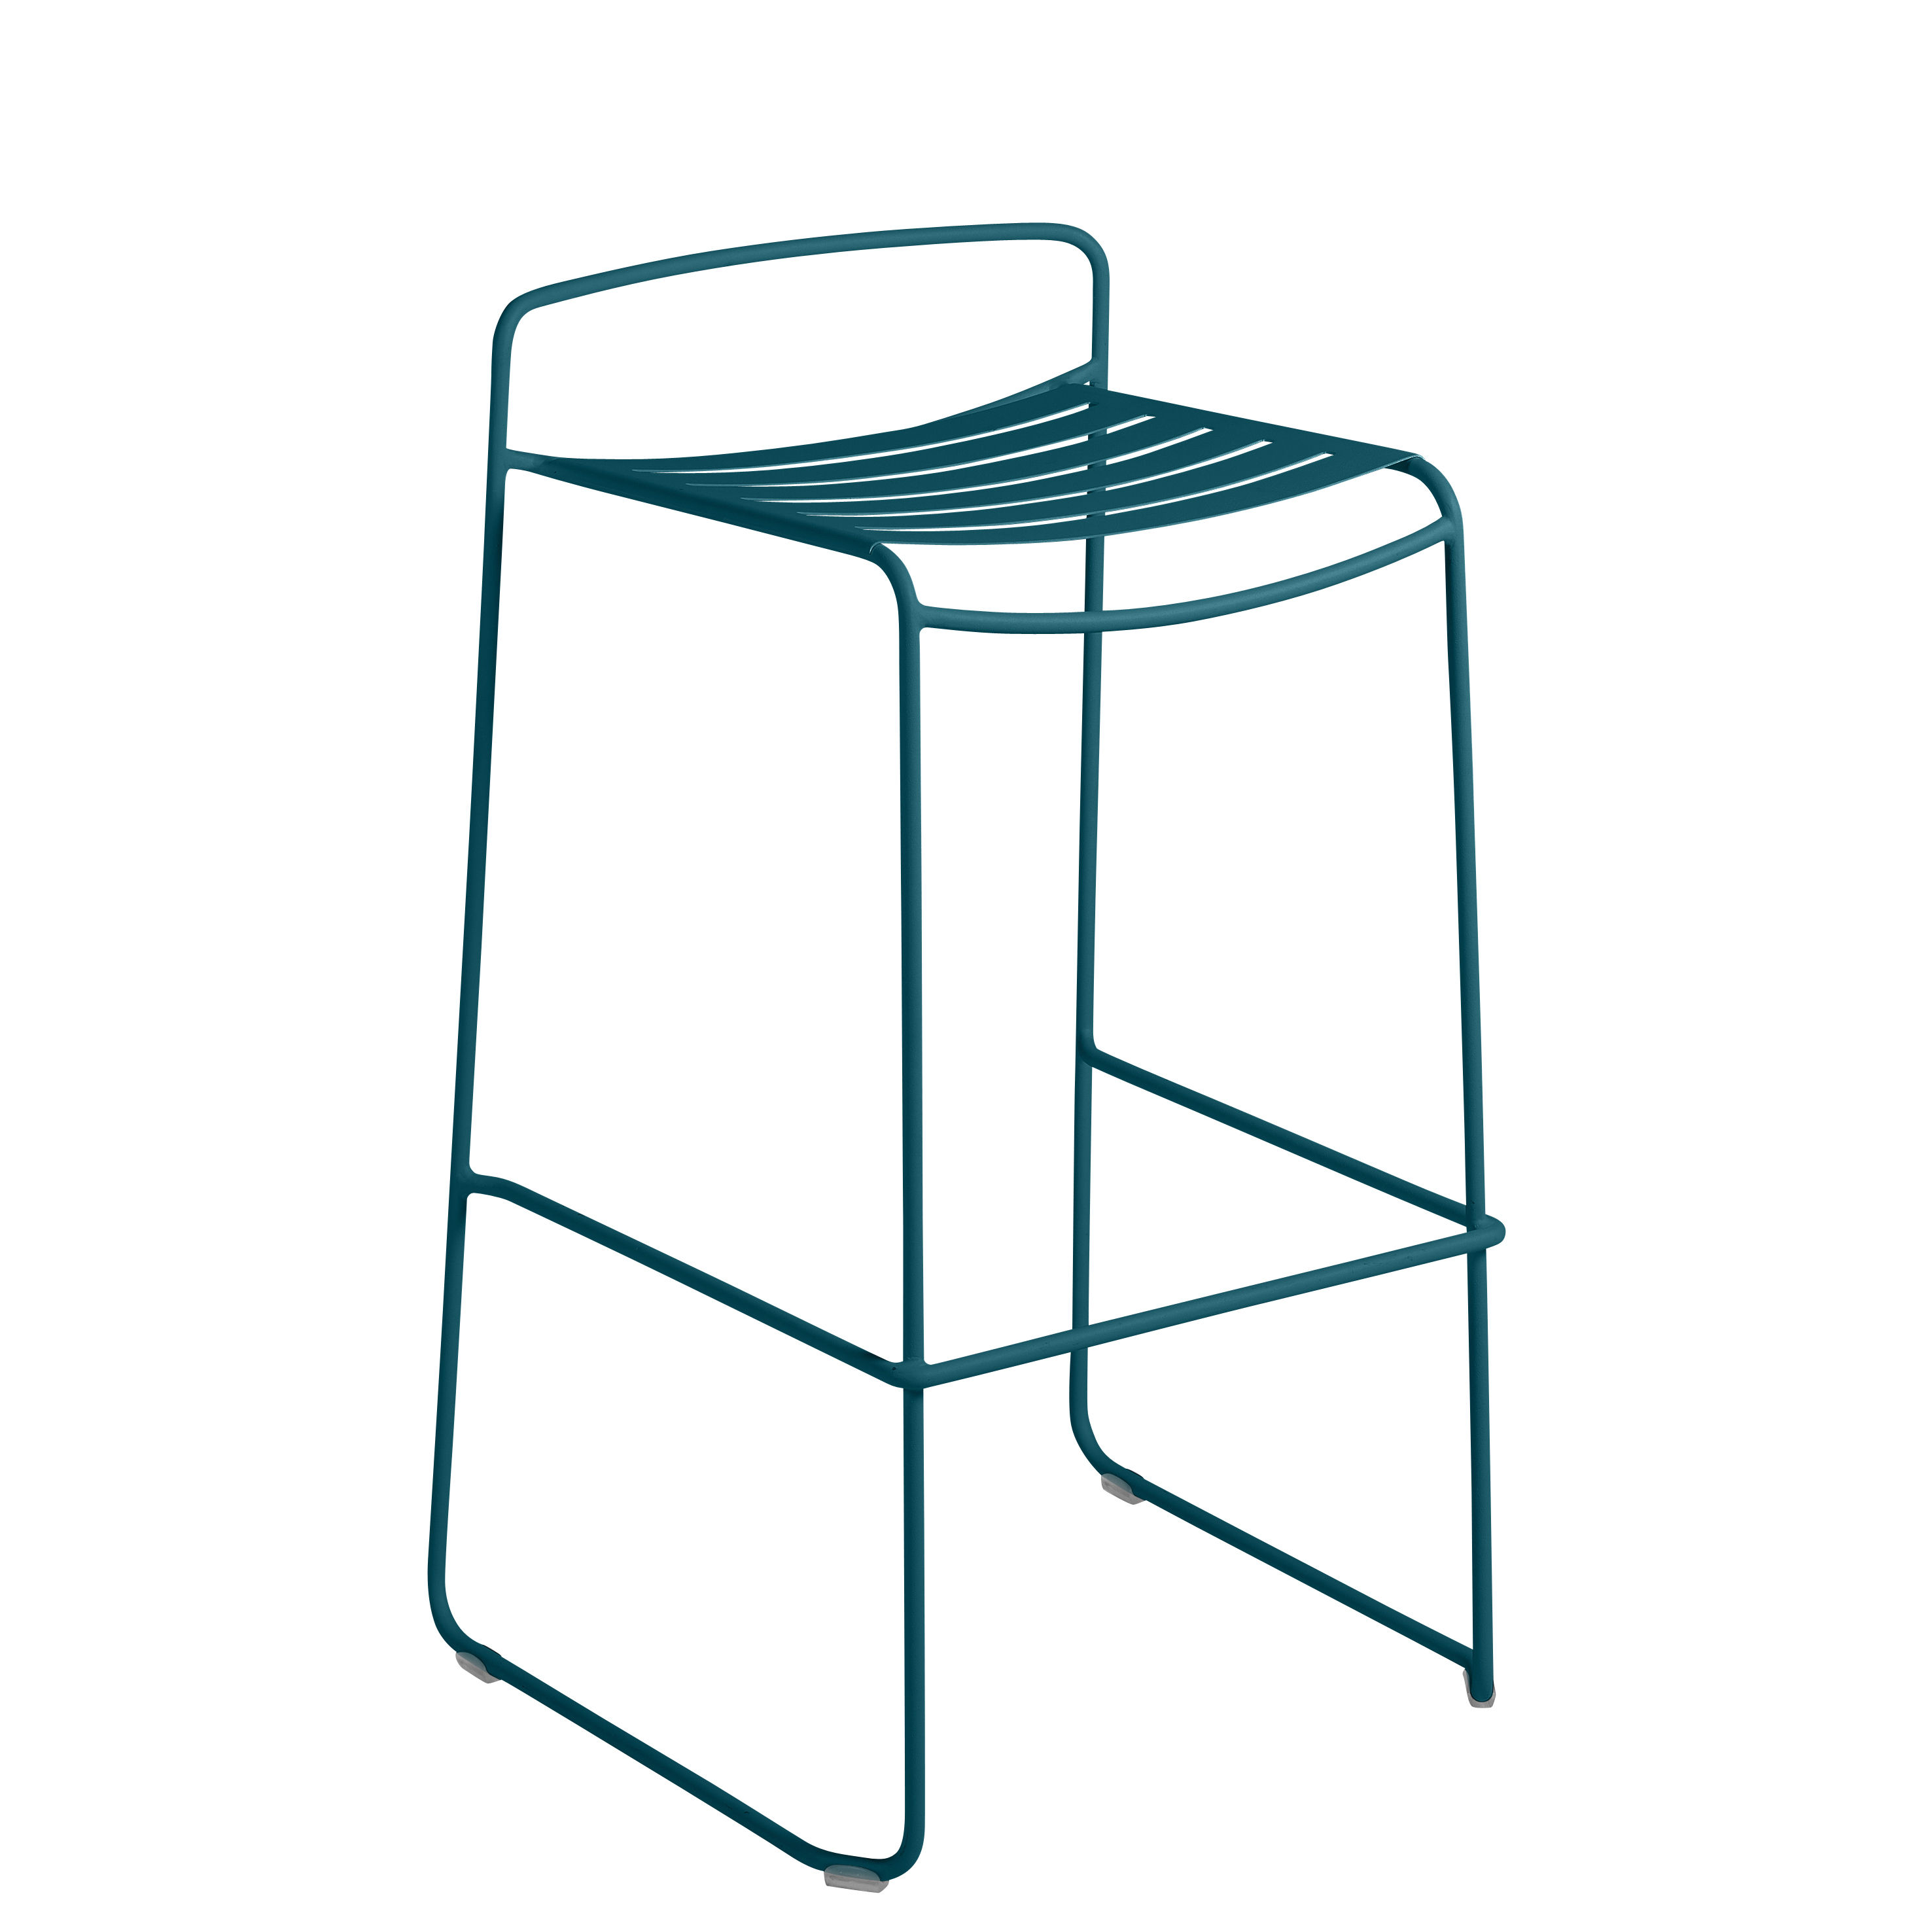 Möbel - Barhocker - Surprising Barhocker / Metall - H 78 cm - Fermob - Acapulcoblau - bemalter Stahl